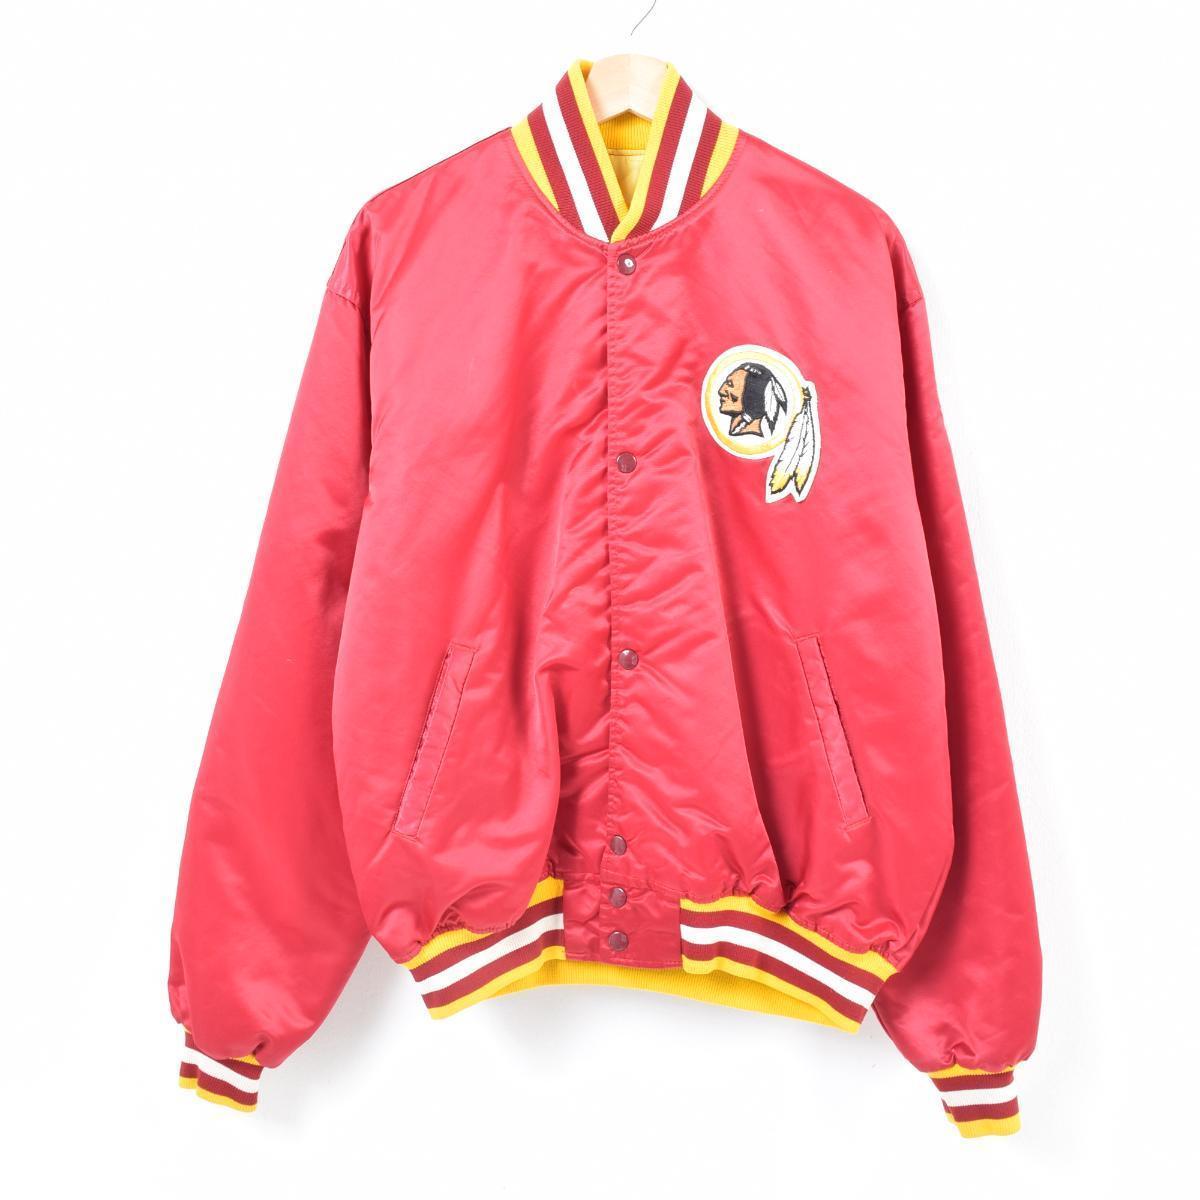 finest selection be371 31aca Men XL /war7338 made in starter Starter NFL WASHINGTON REDSKINS Washington  Redskins nylon award jacket Award jacket USA